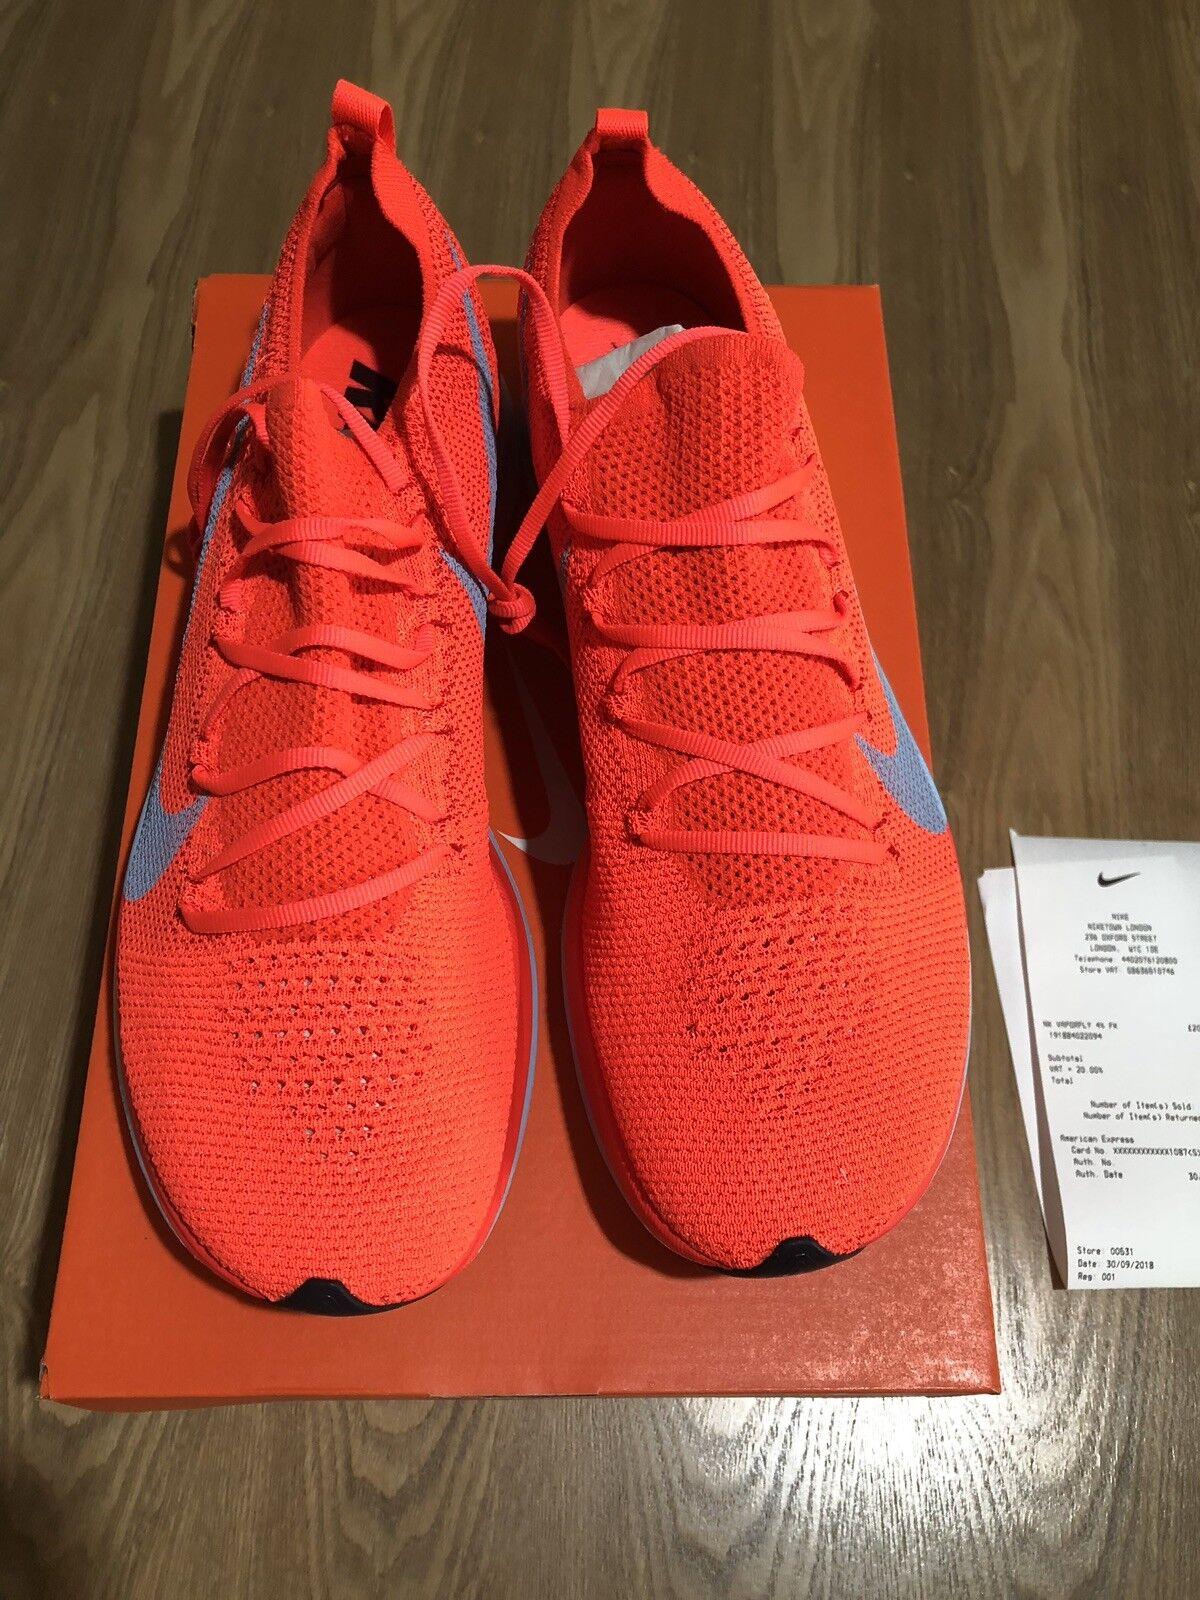 Nike Zoom Vaporfly 4% Flyknit BRIGHT CRIMSON UK10 US11 EU45 | Forma elegante  | Uomini/Donna Scarpa